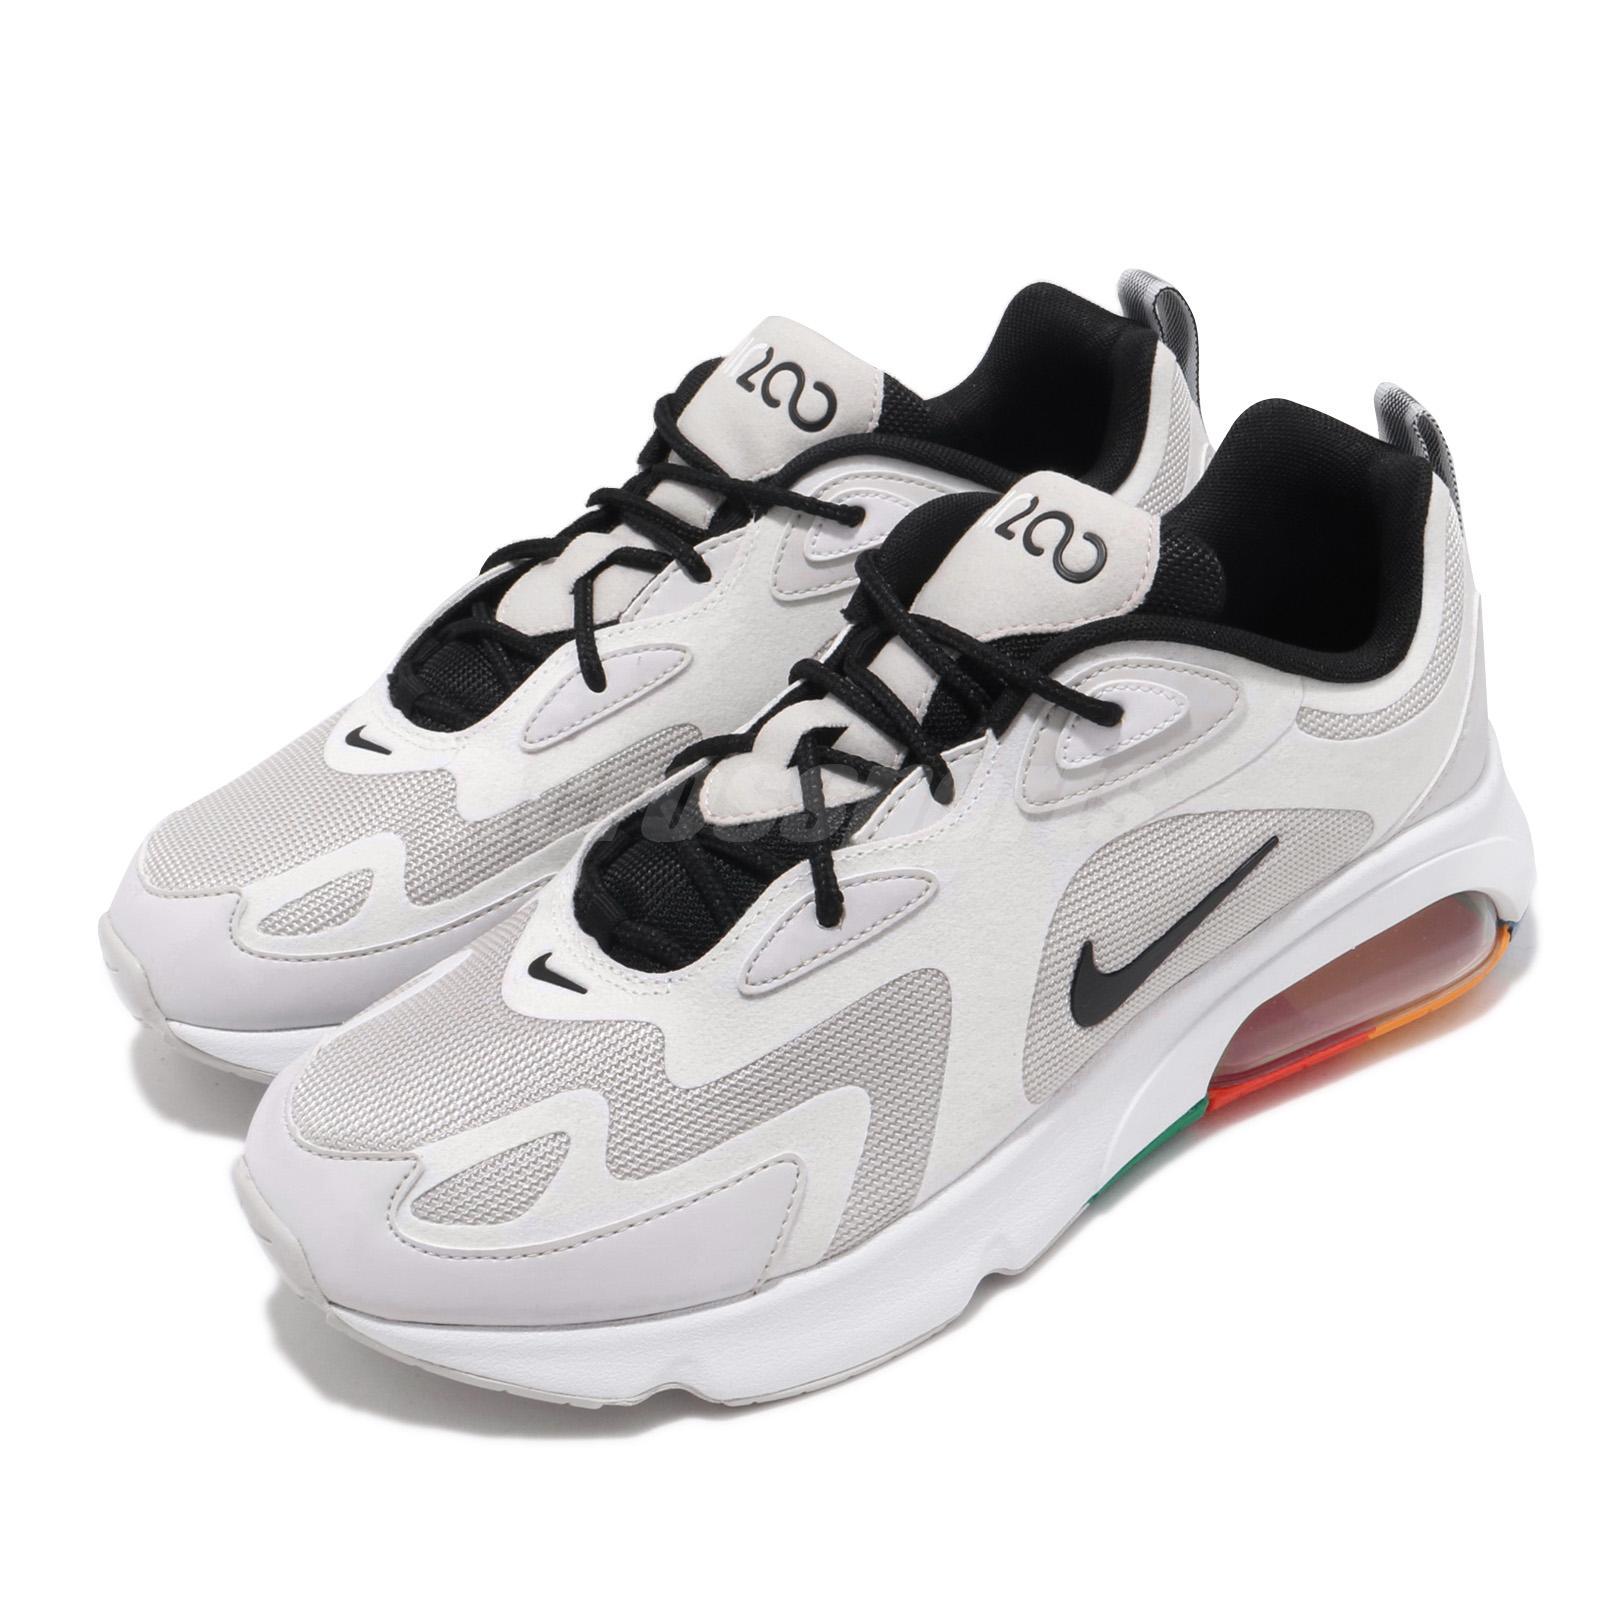 Nike Air Max 270 Flyknit White Rainbow AH6789 700 Womens Running Shoes ah6789 700i